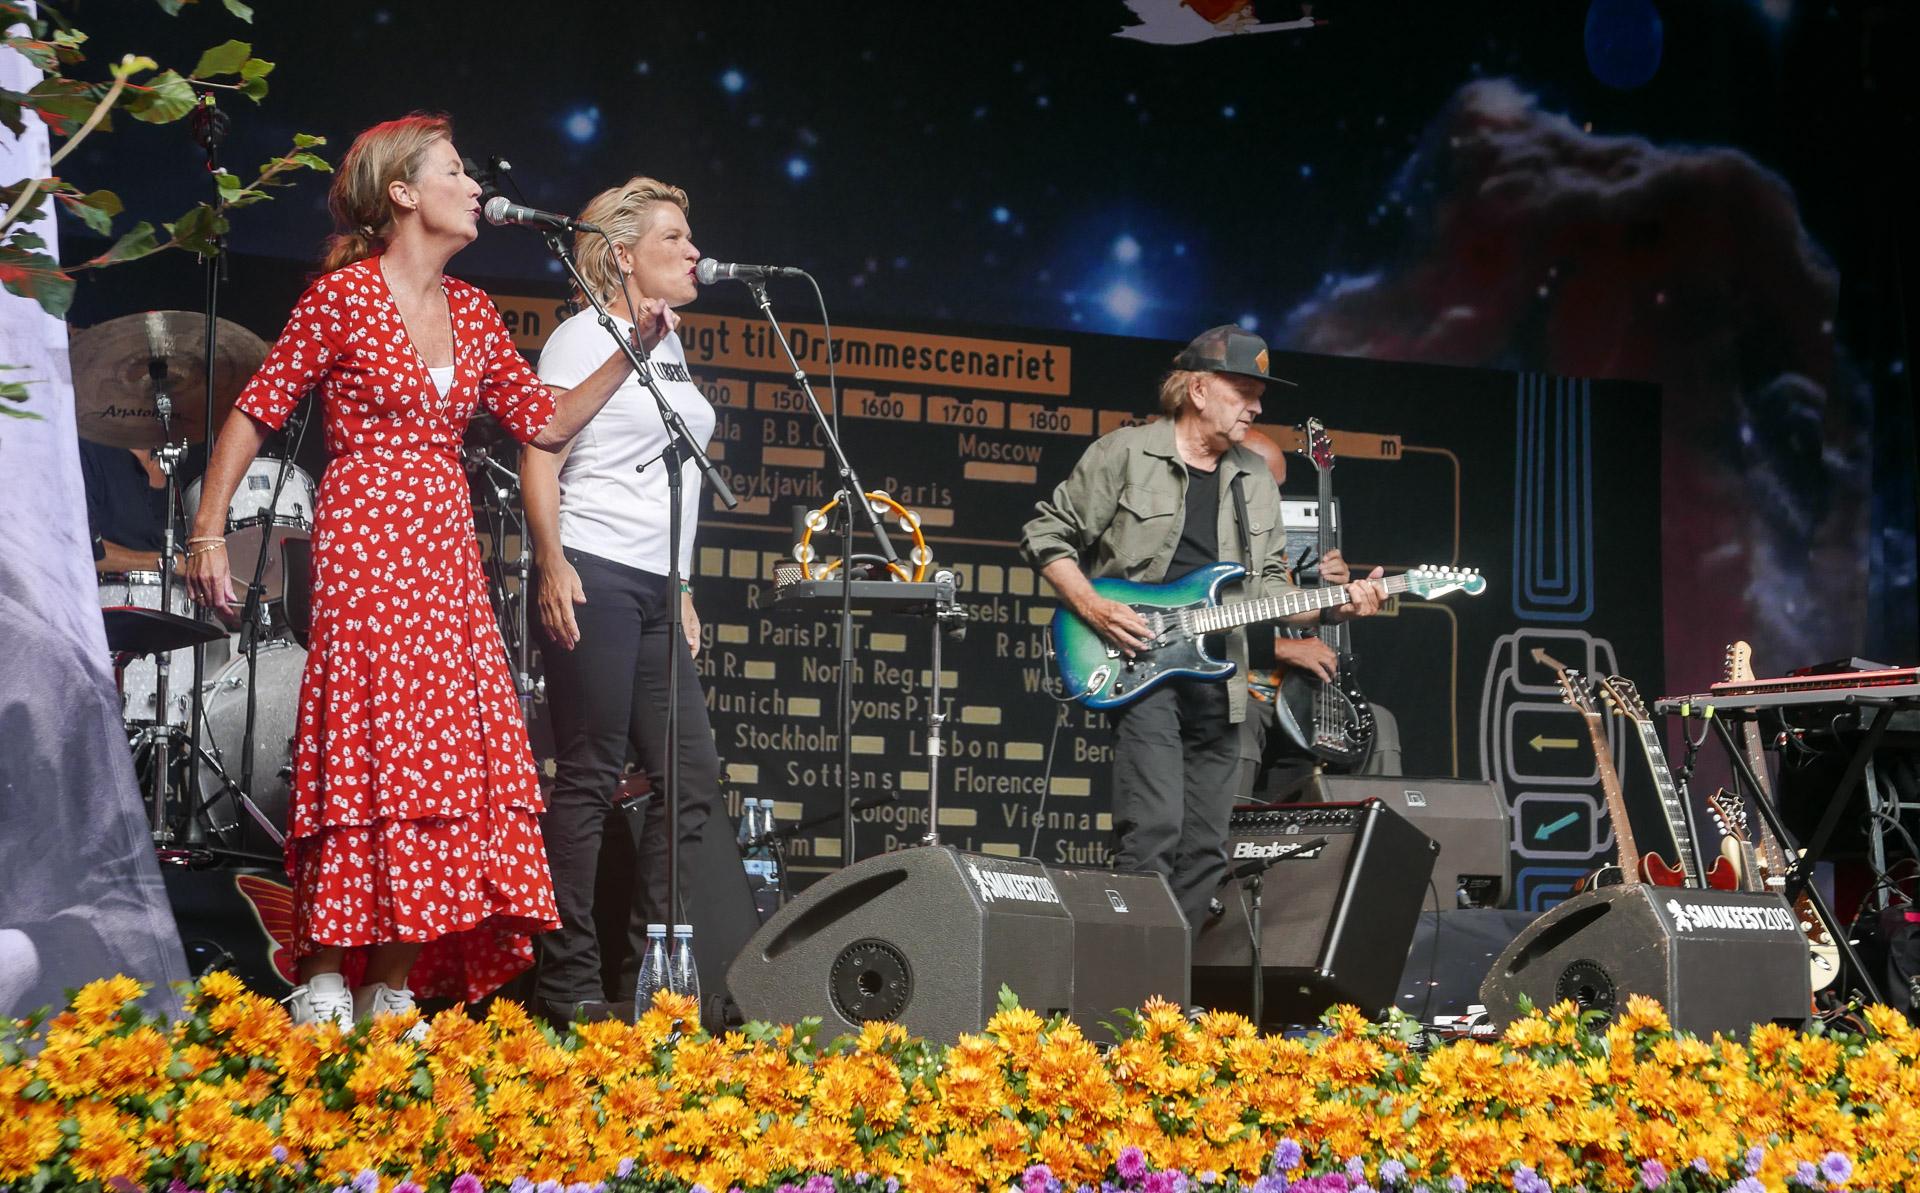 Anmeldelse: Sebastian Band spillede solen tilbage til Skanderborg